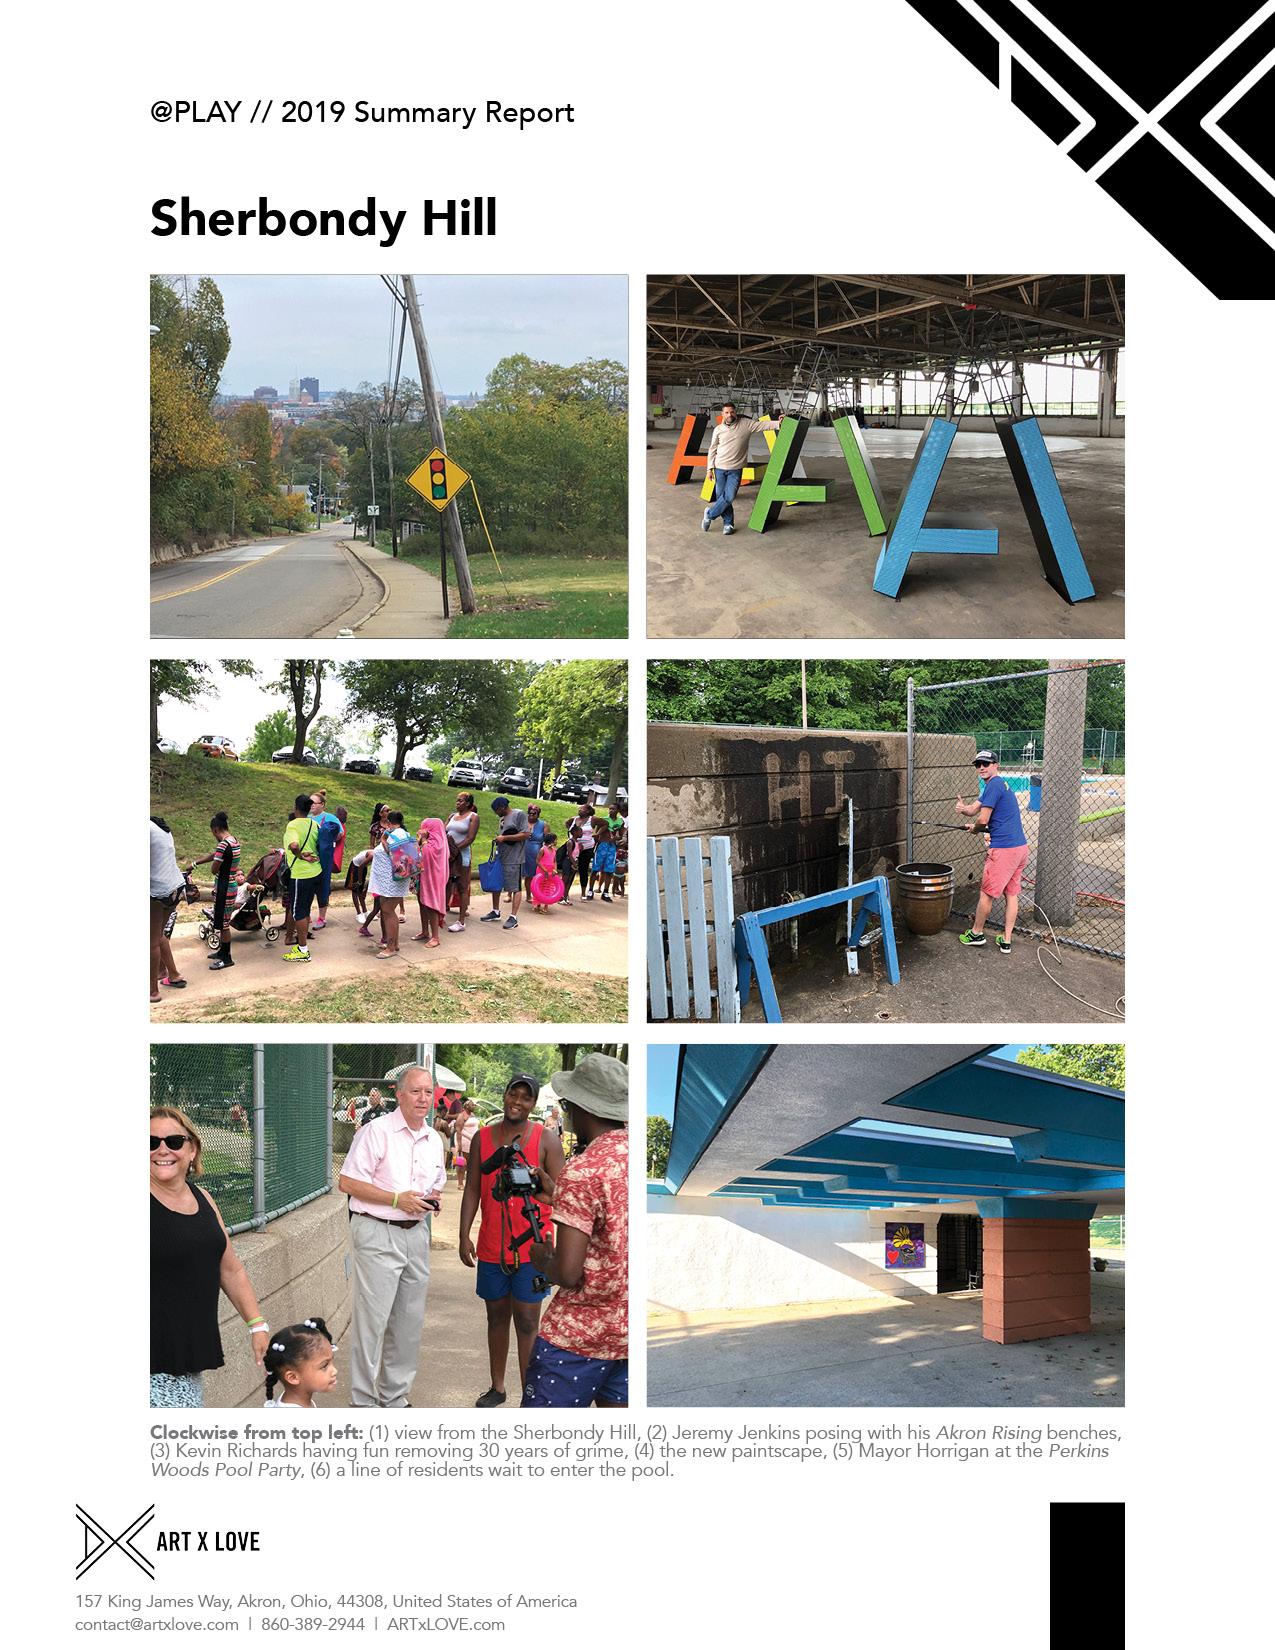 190215_@PLAY_2019_Neighborhood-Pages42.jpg